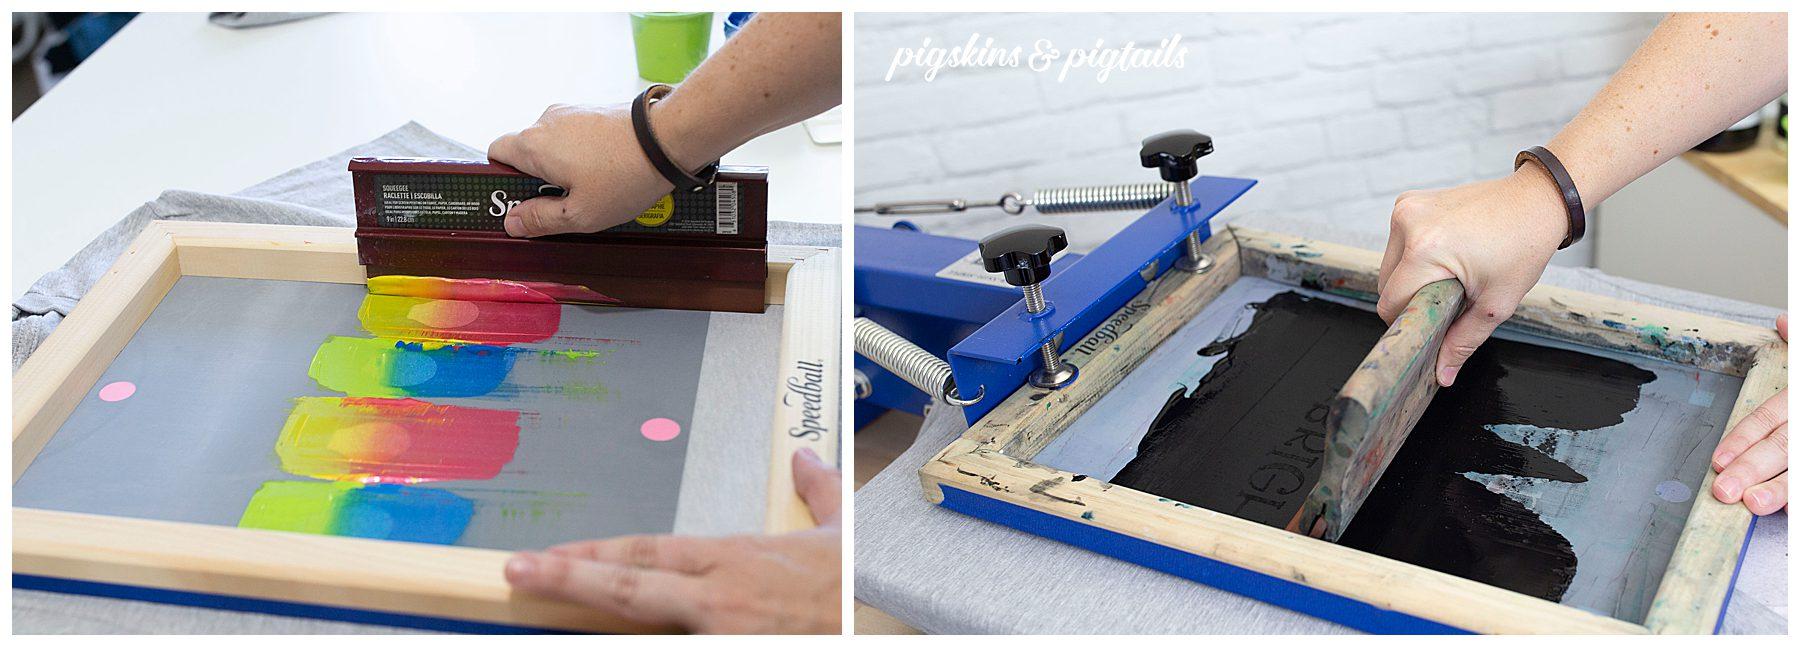 Multi-color designs diy screen printing with Cricut vinyl